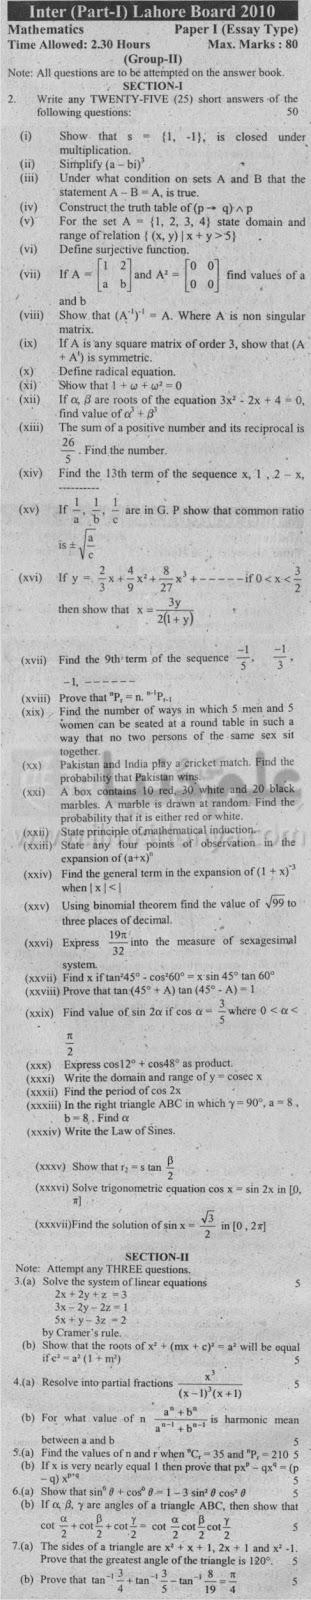 Inter Part I Mathematics Objective Paper I Group I Lahore Board 2011